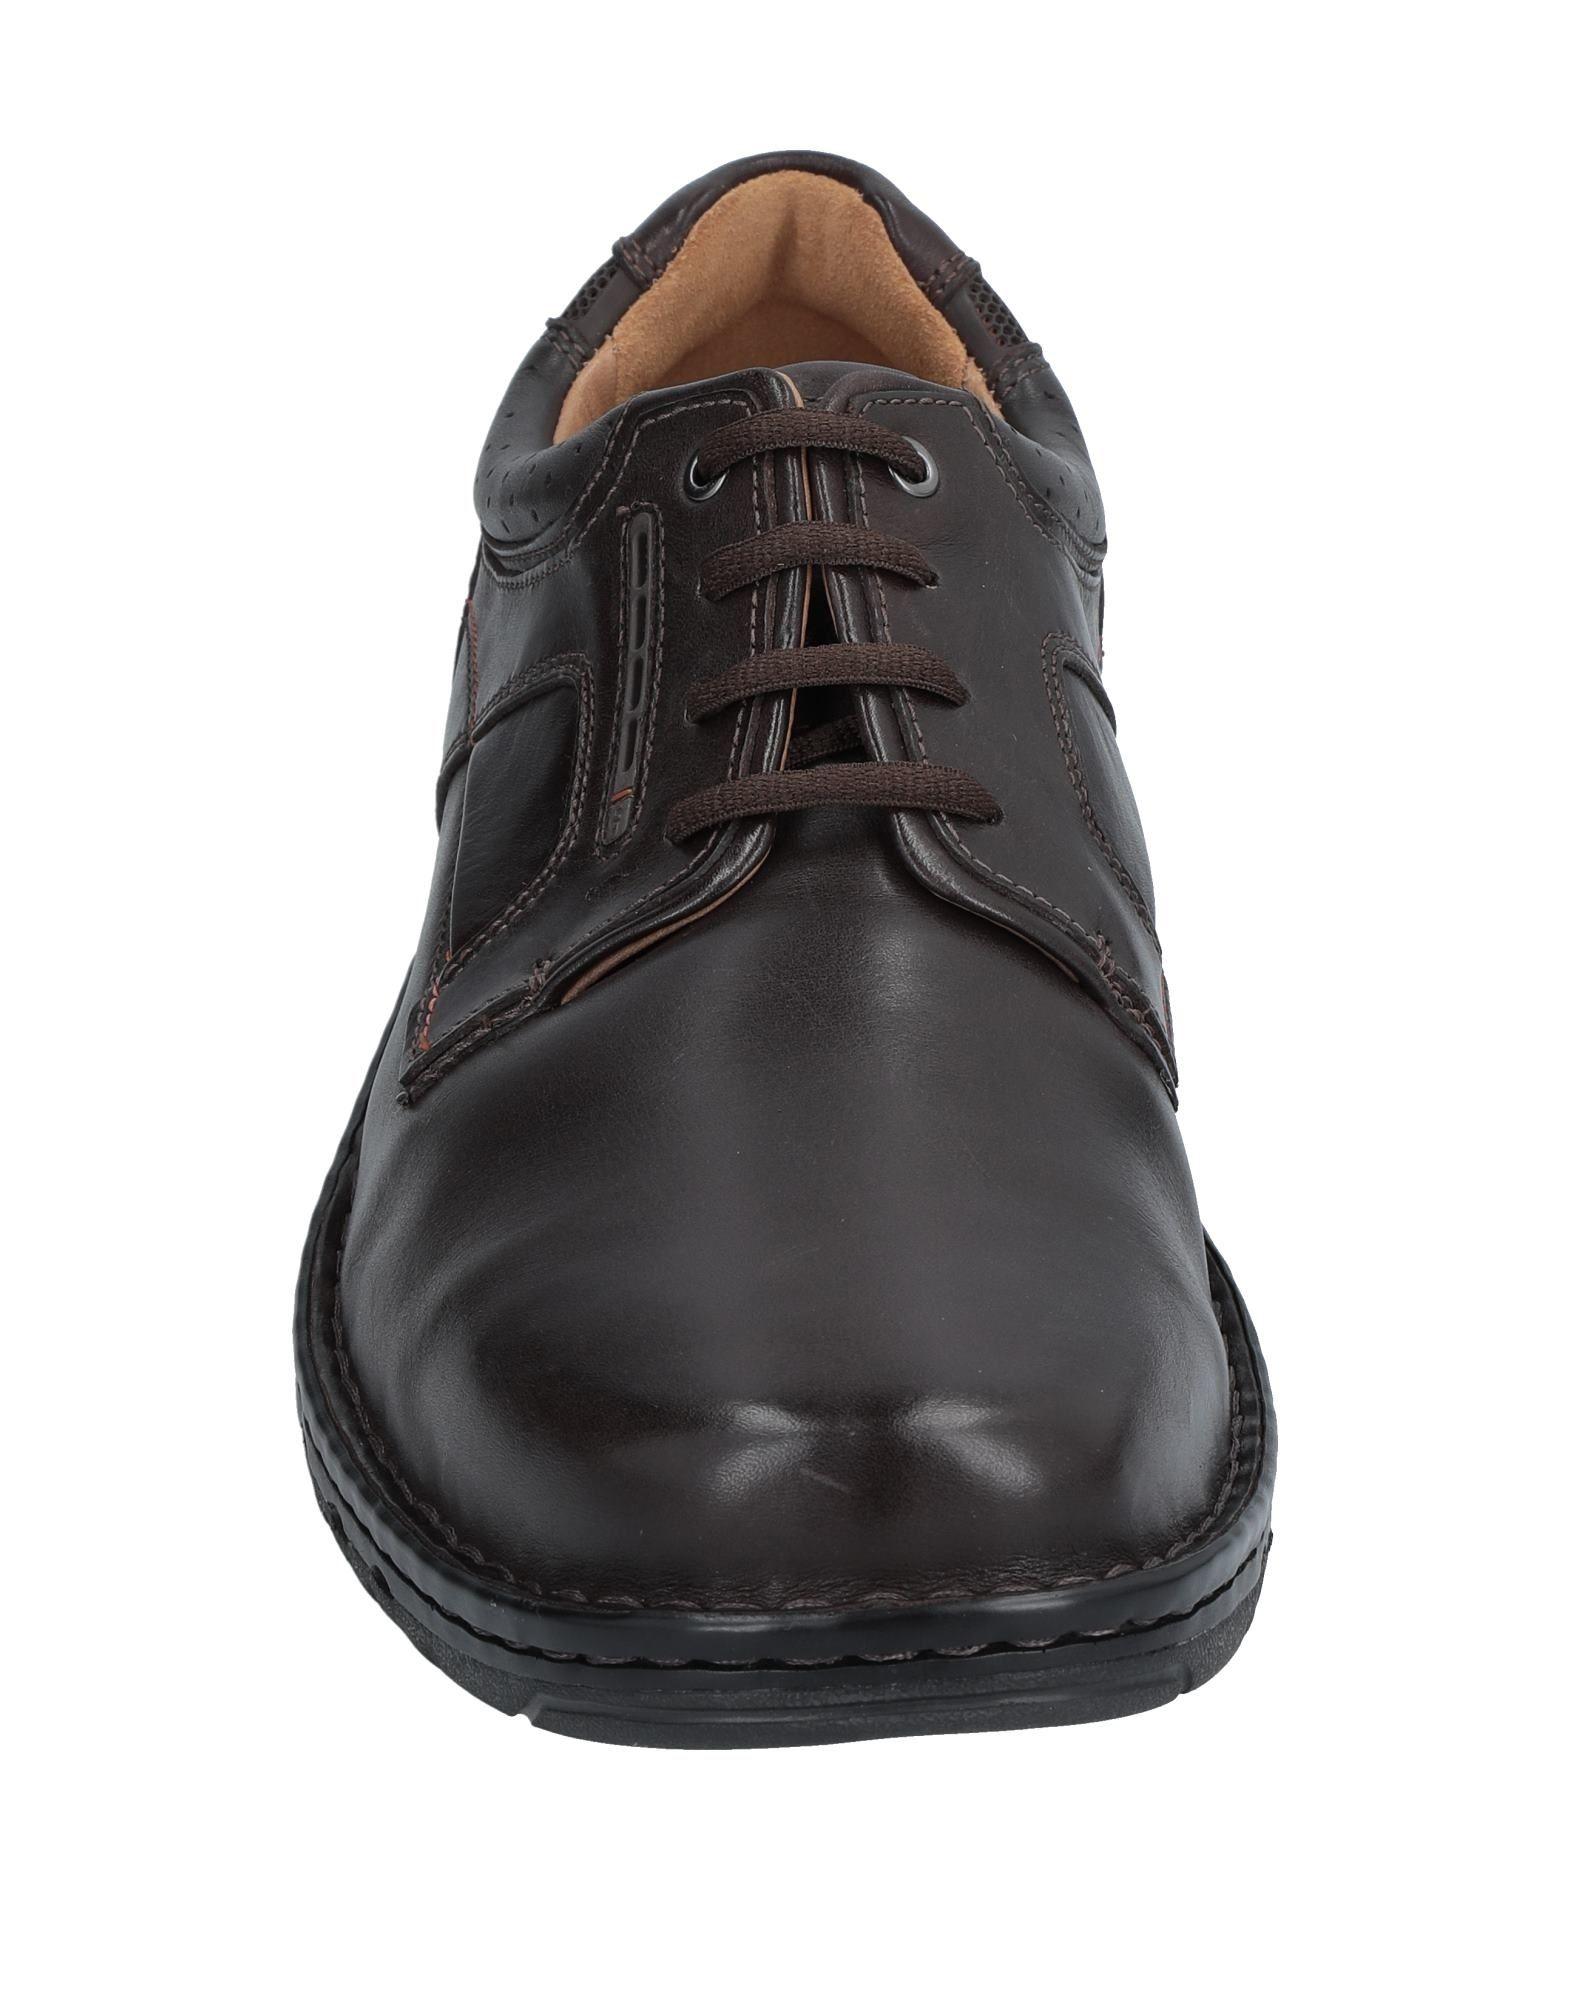 Rabatt echte Schuhe Clarks Schnürschuhe Herren  11533399KD